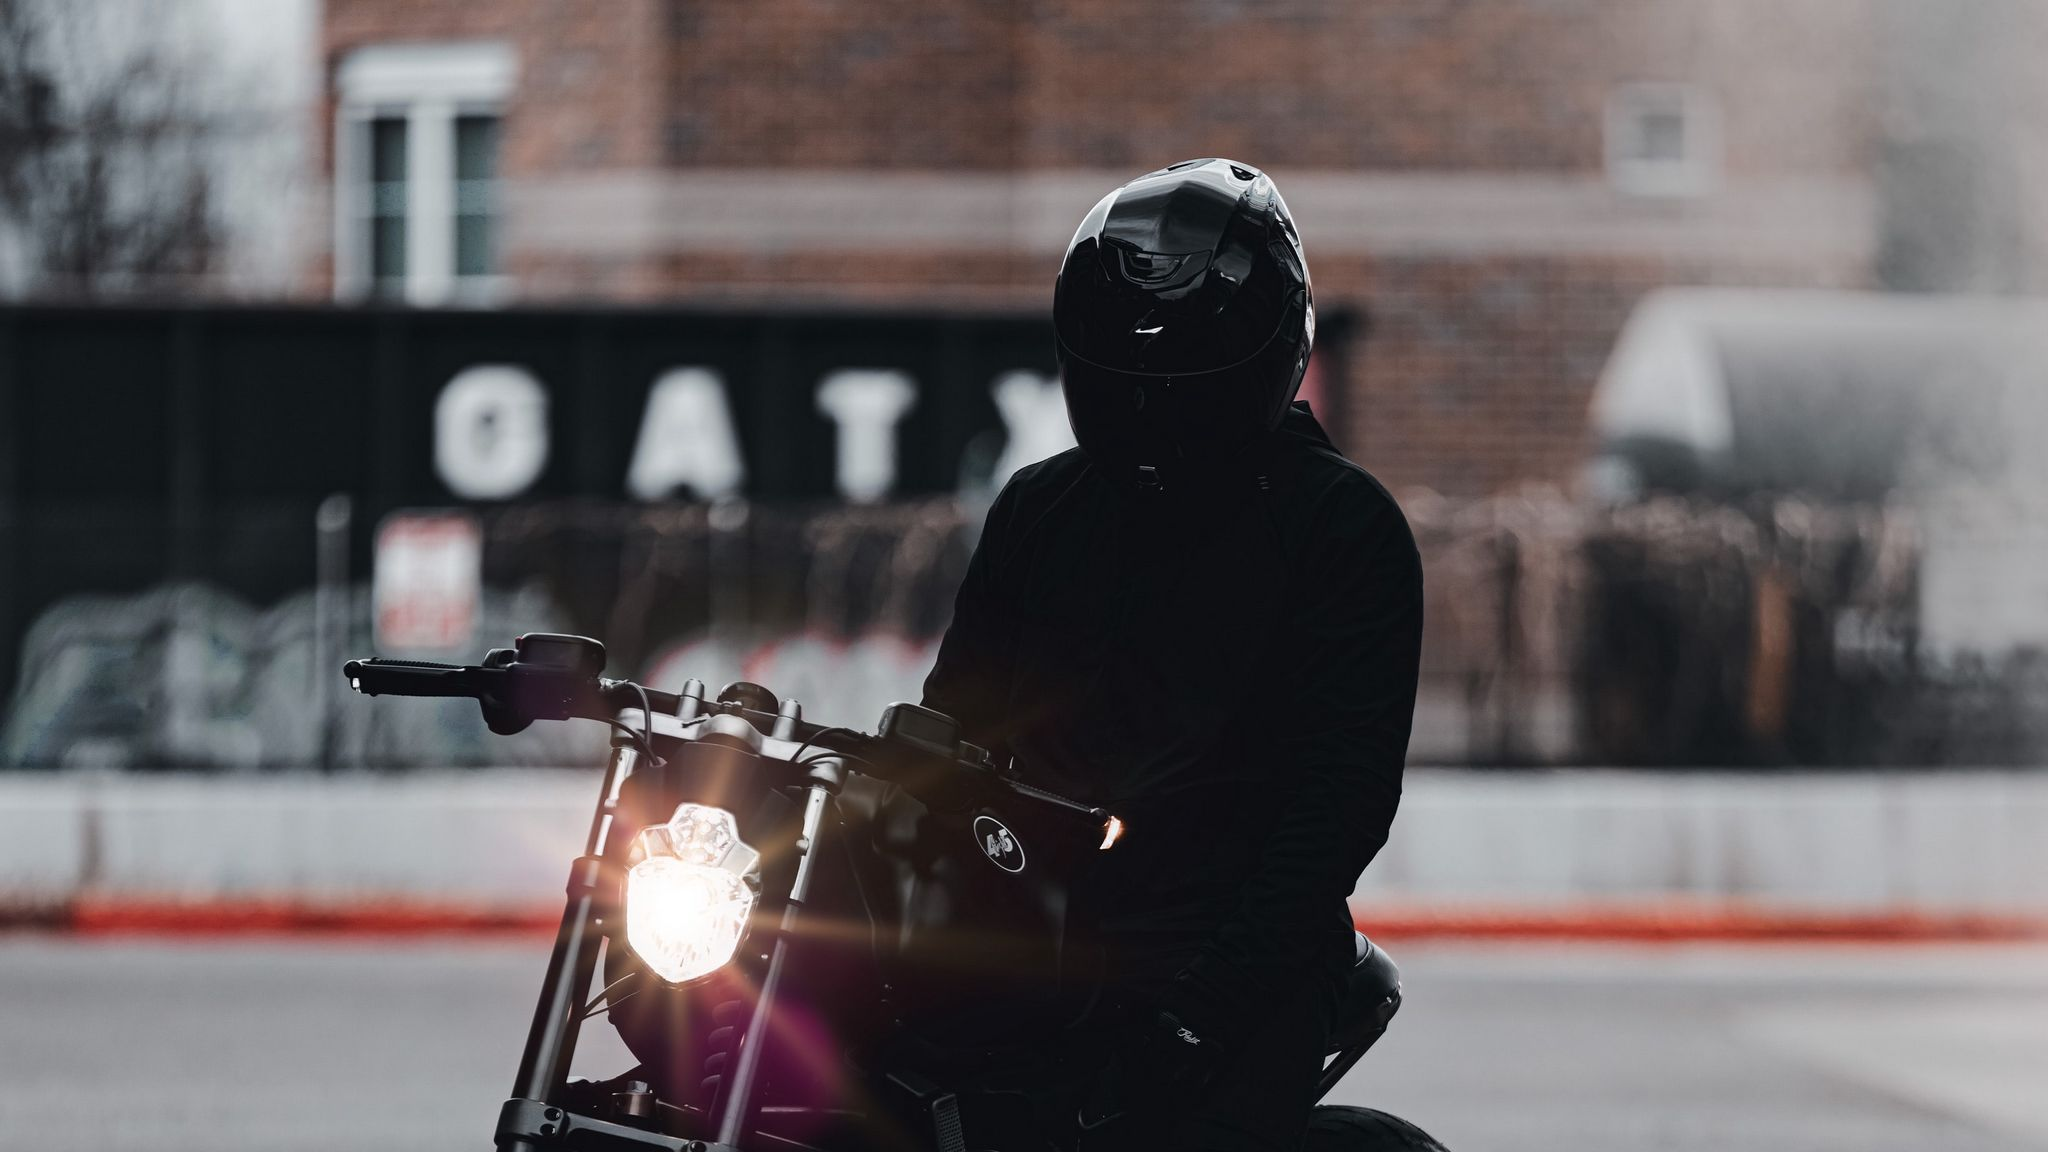 2048x1152 Обои мотоцикл, байк, мотоциклист, черный, свет, дорога